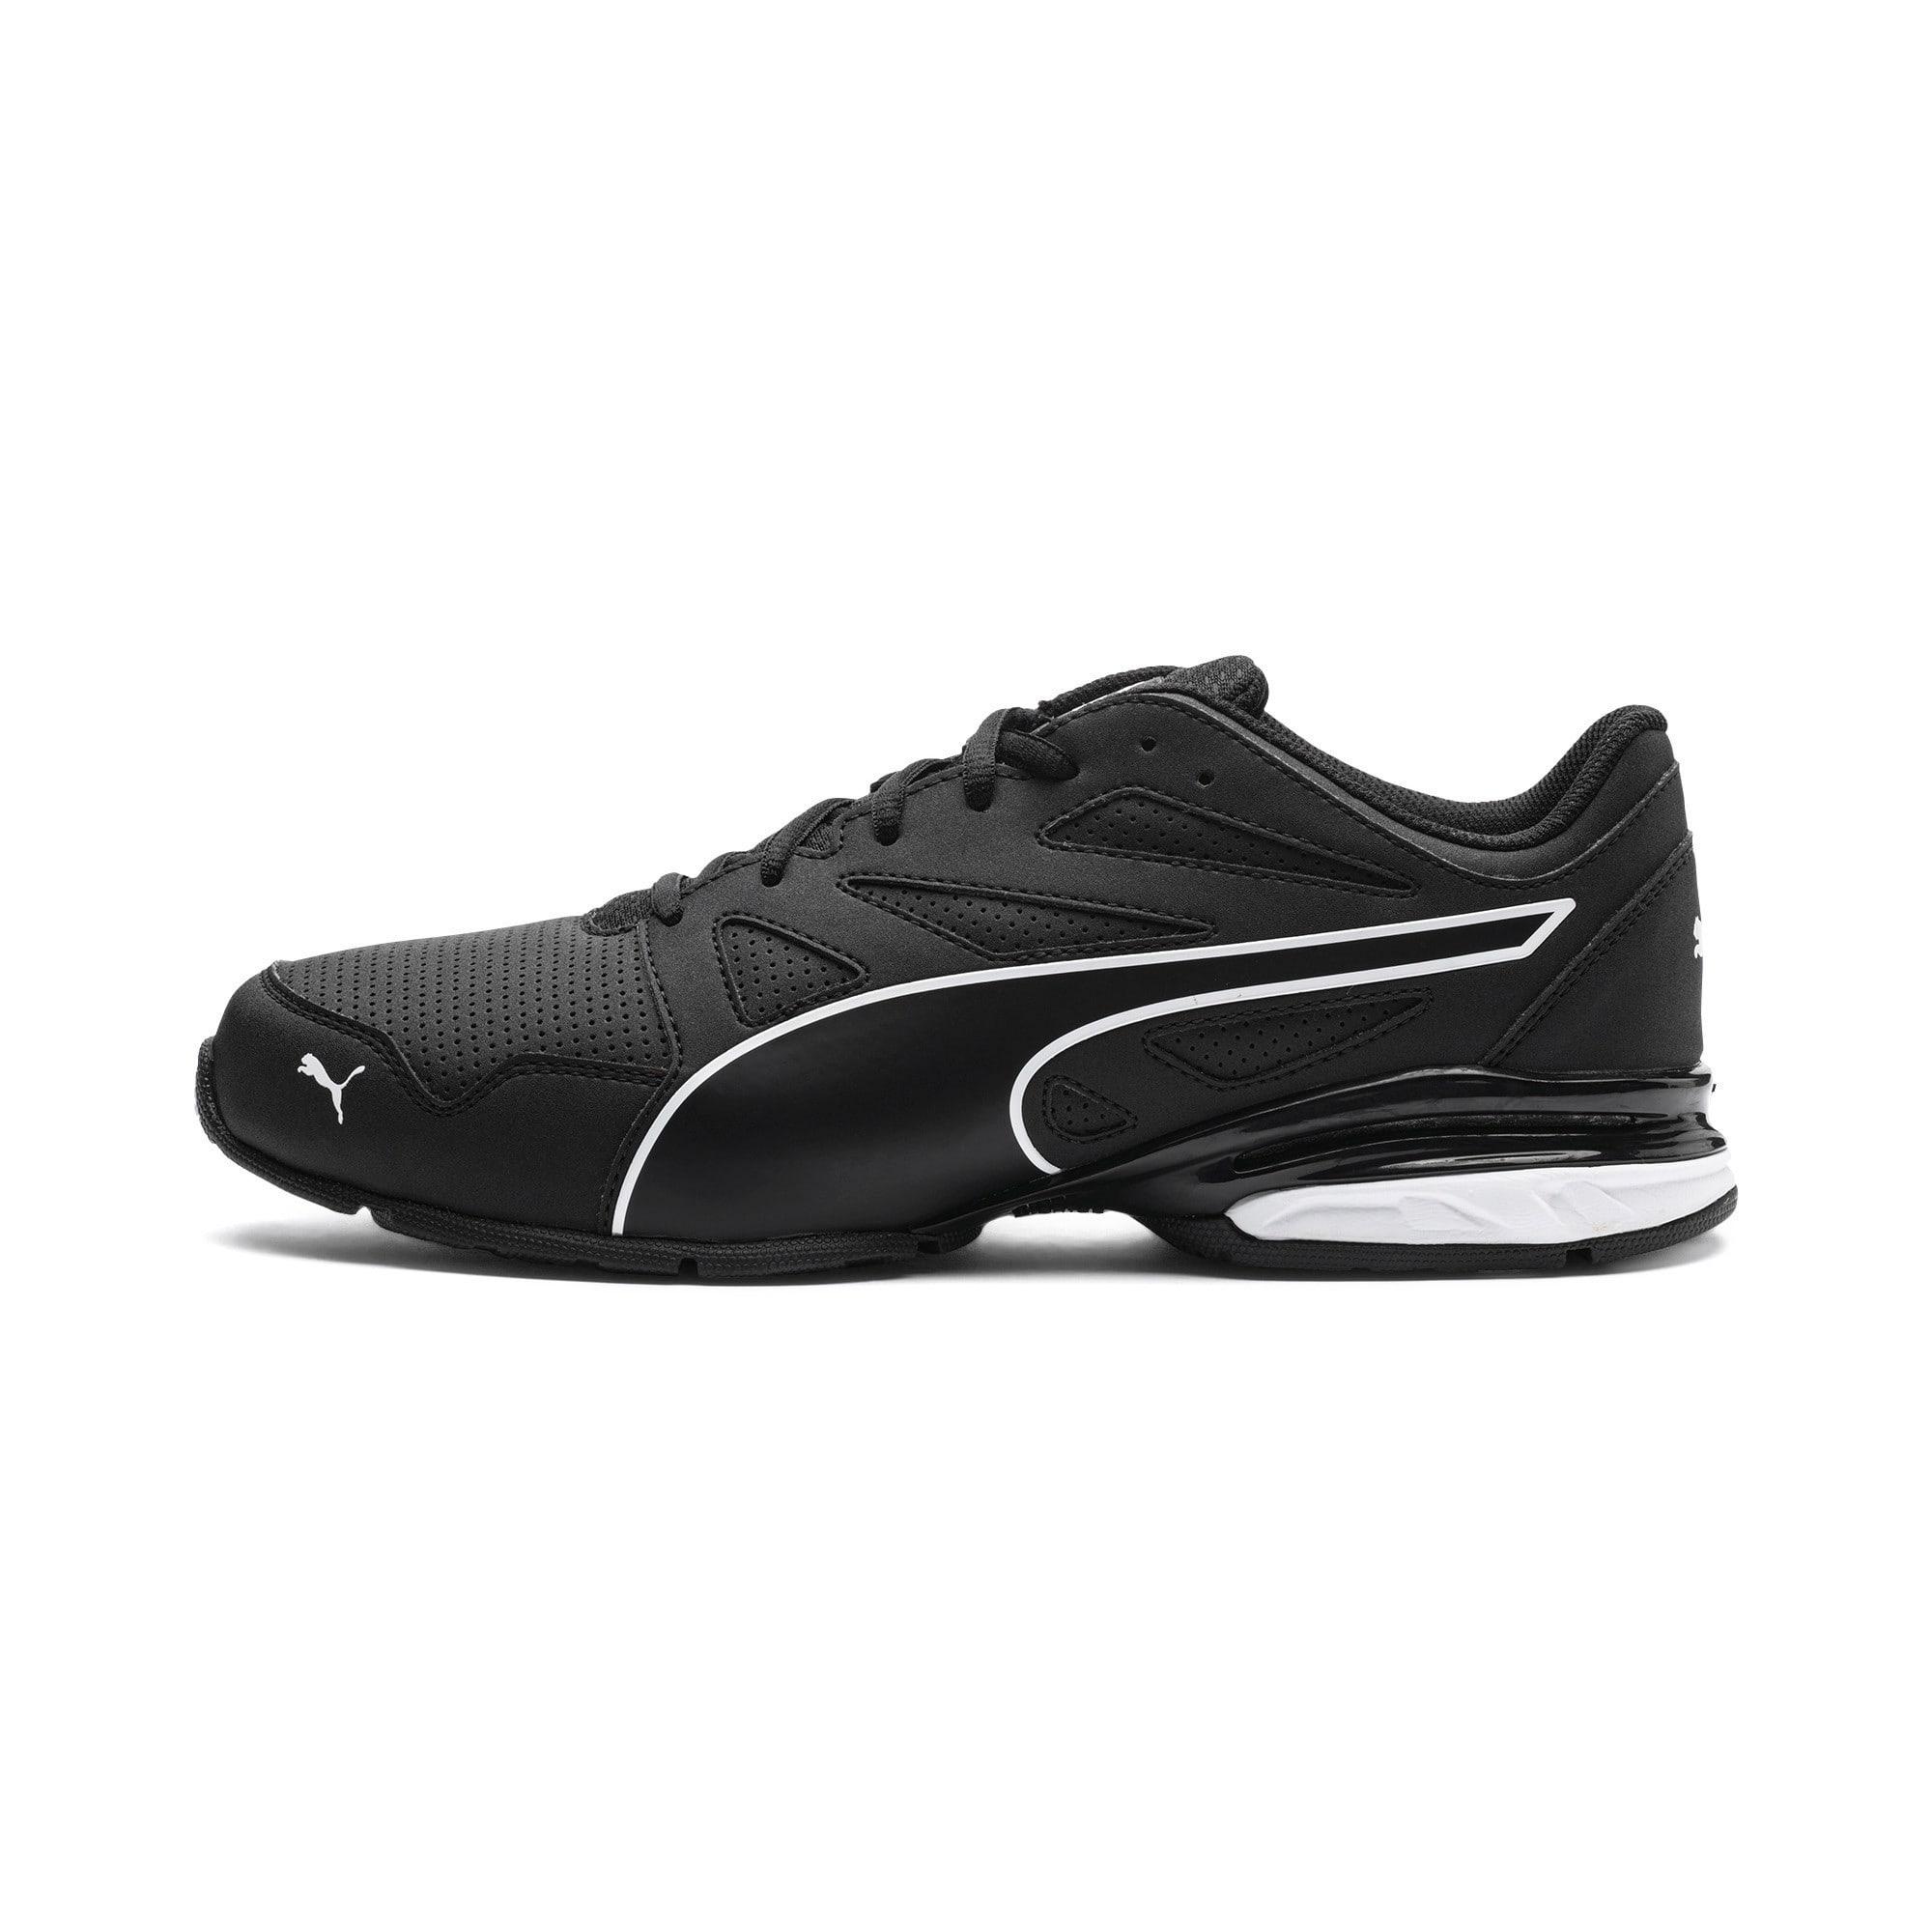 Thumbnail 1 of Tazon Modern SL Men's Running Shoes, Puma Black-Puma White, medium-IND